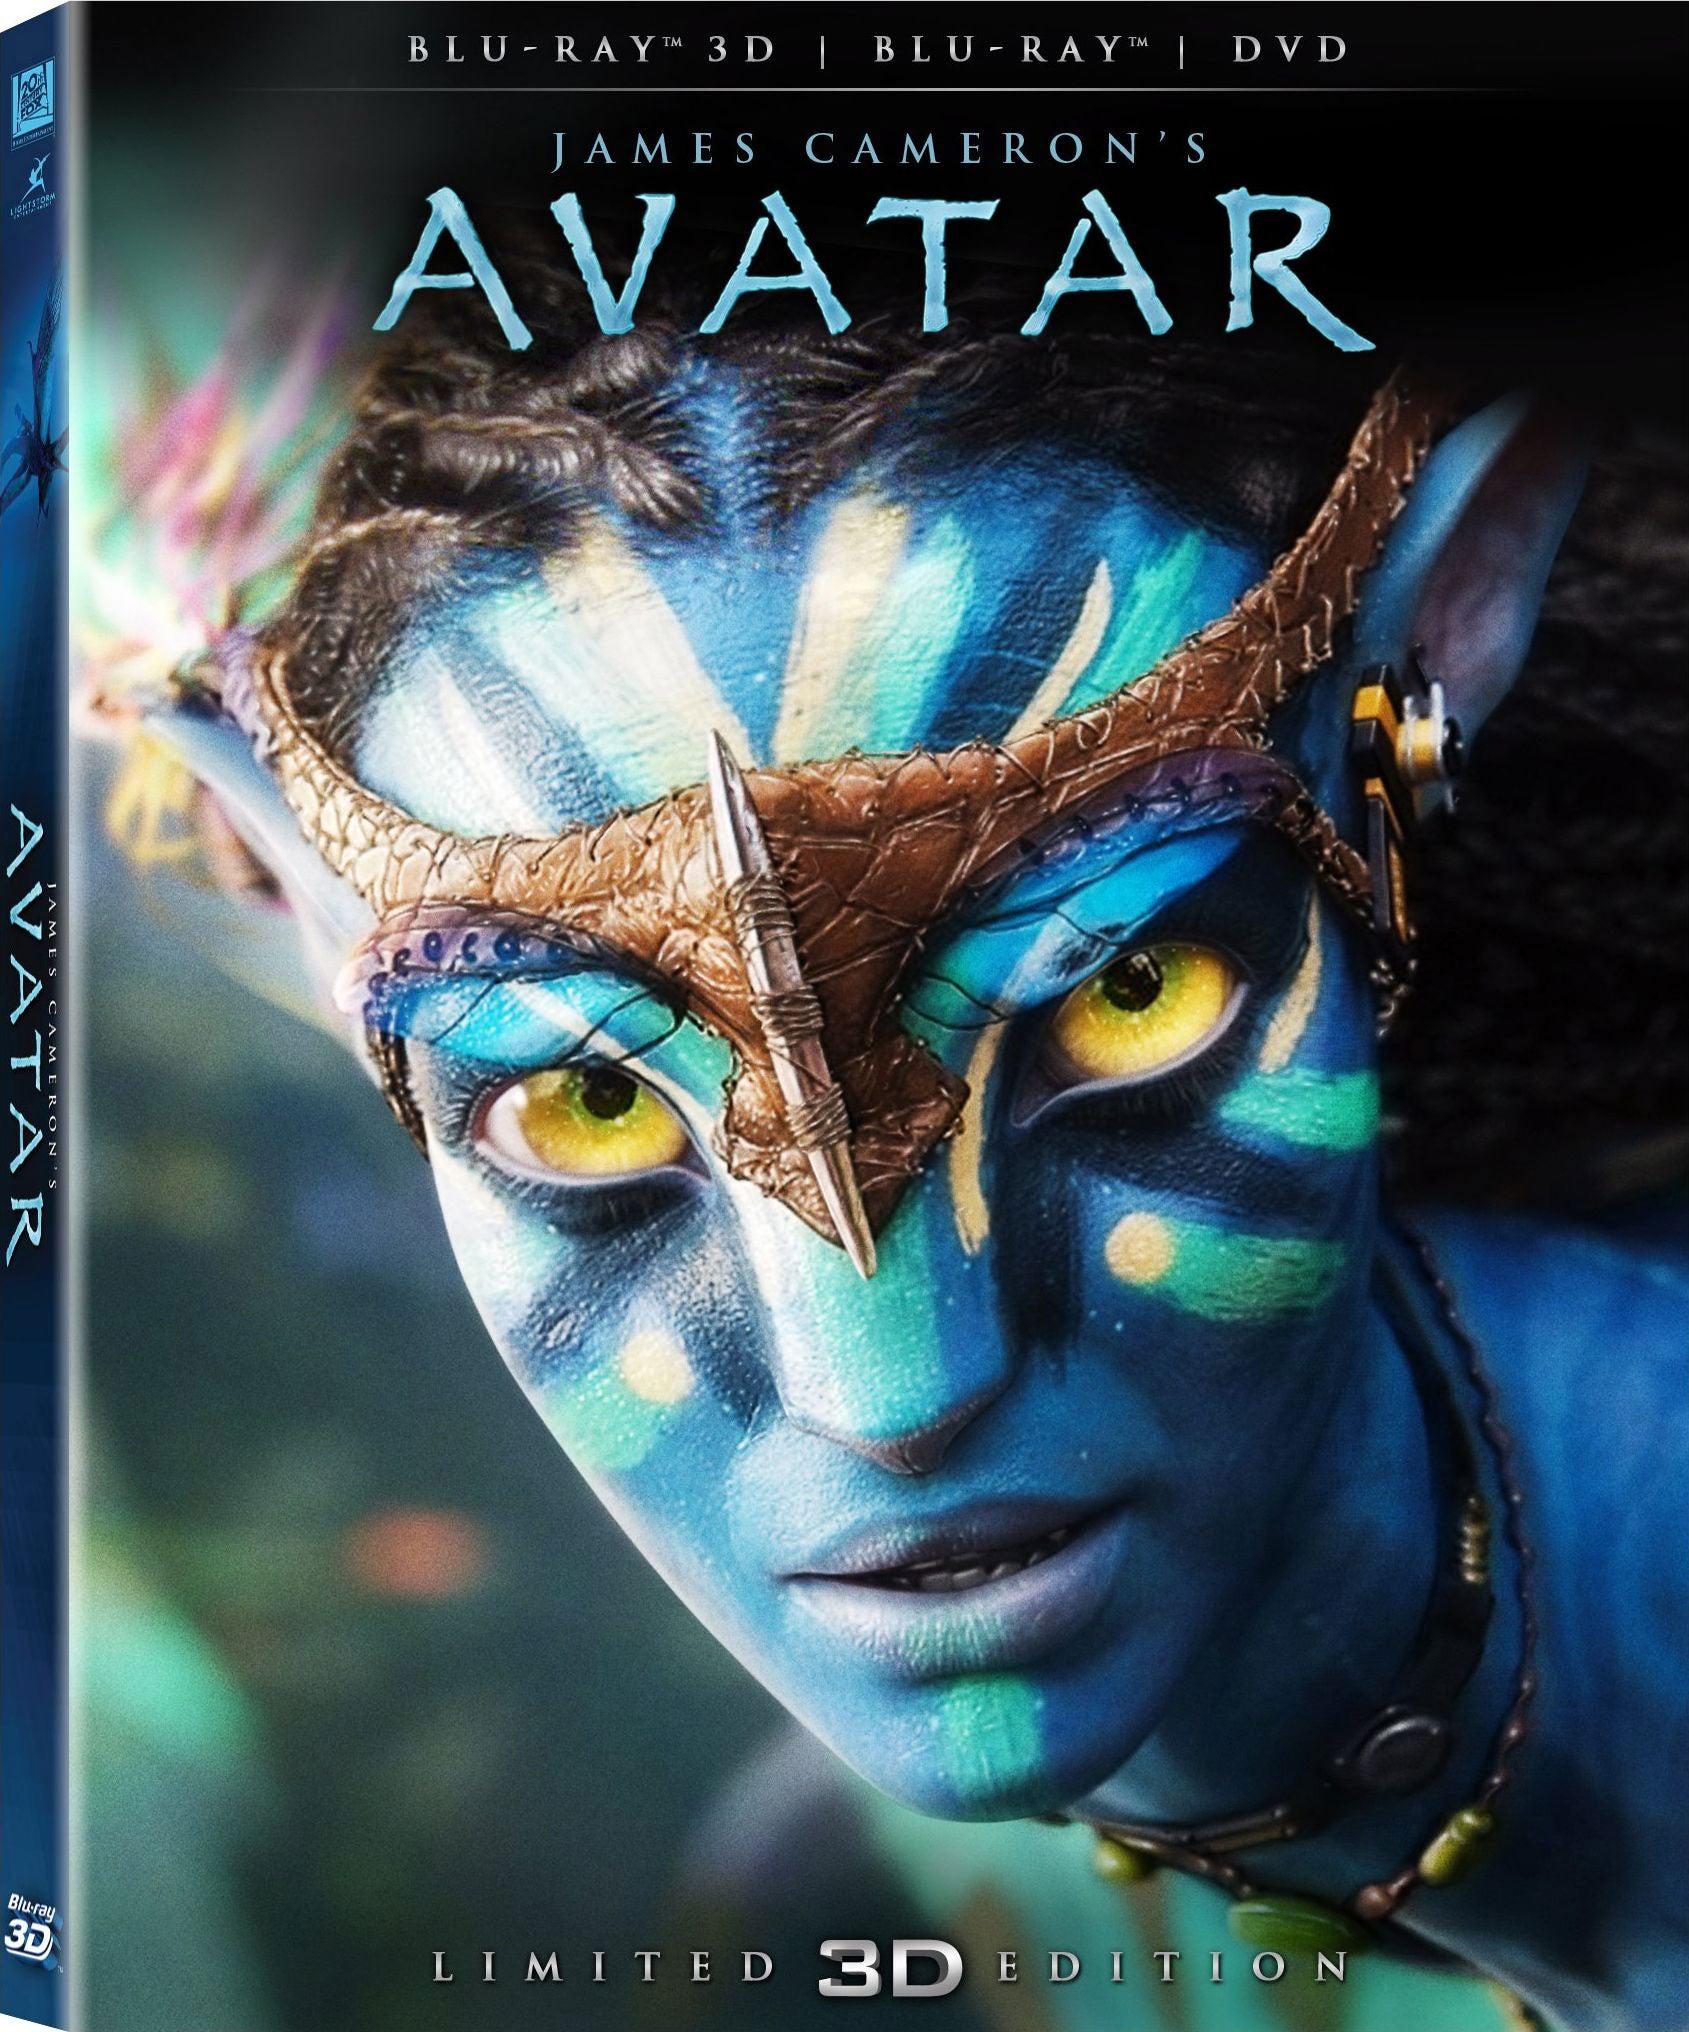 Avatar Limited 3D Edition (Blu-ray/DVD)